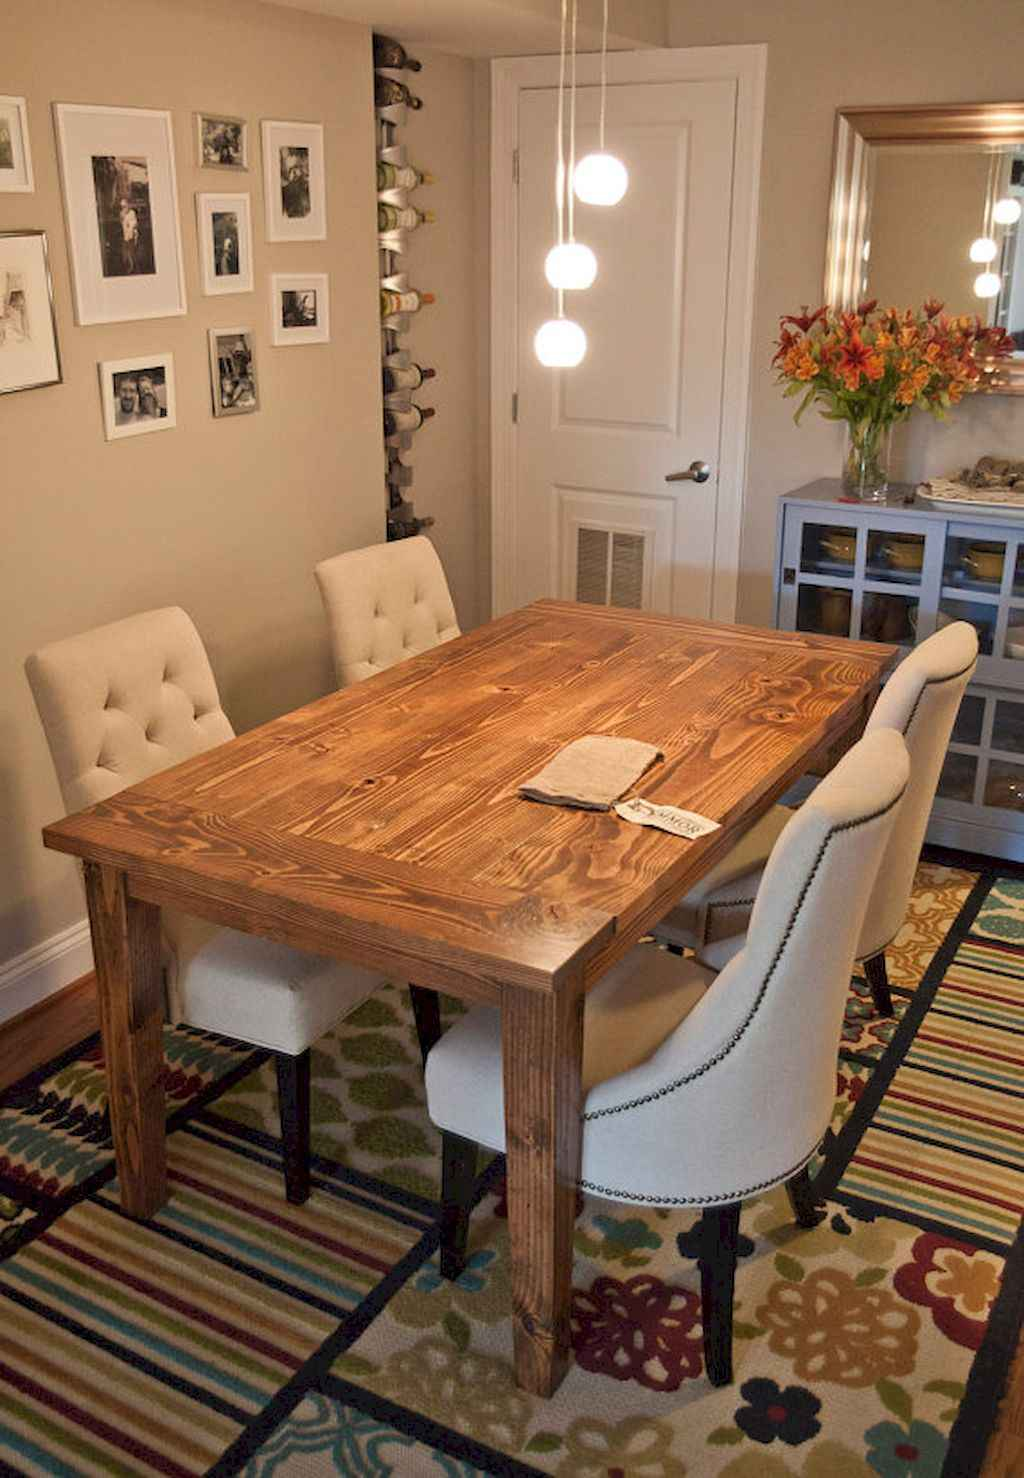 100 Rustic Farmhouse Dining Room Decor Ideas (68)